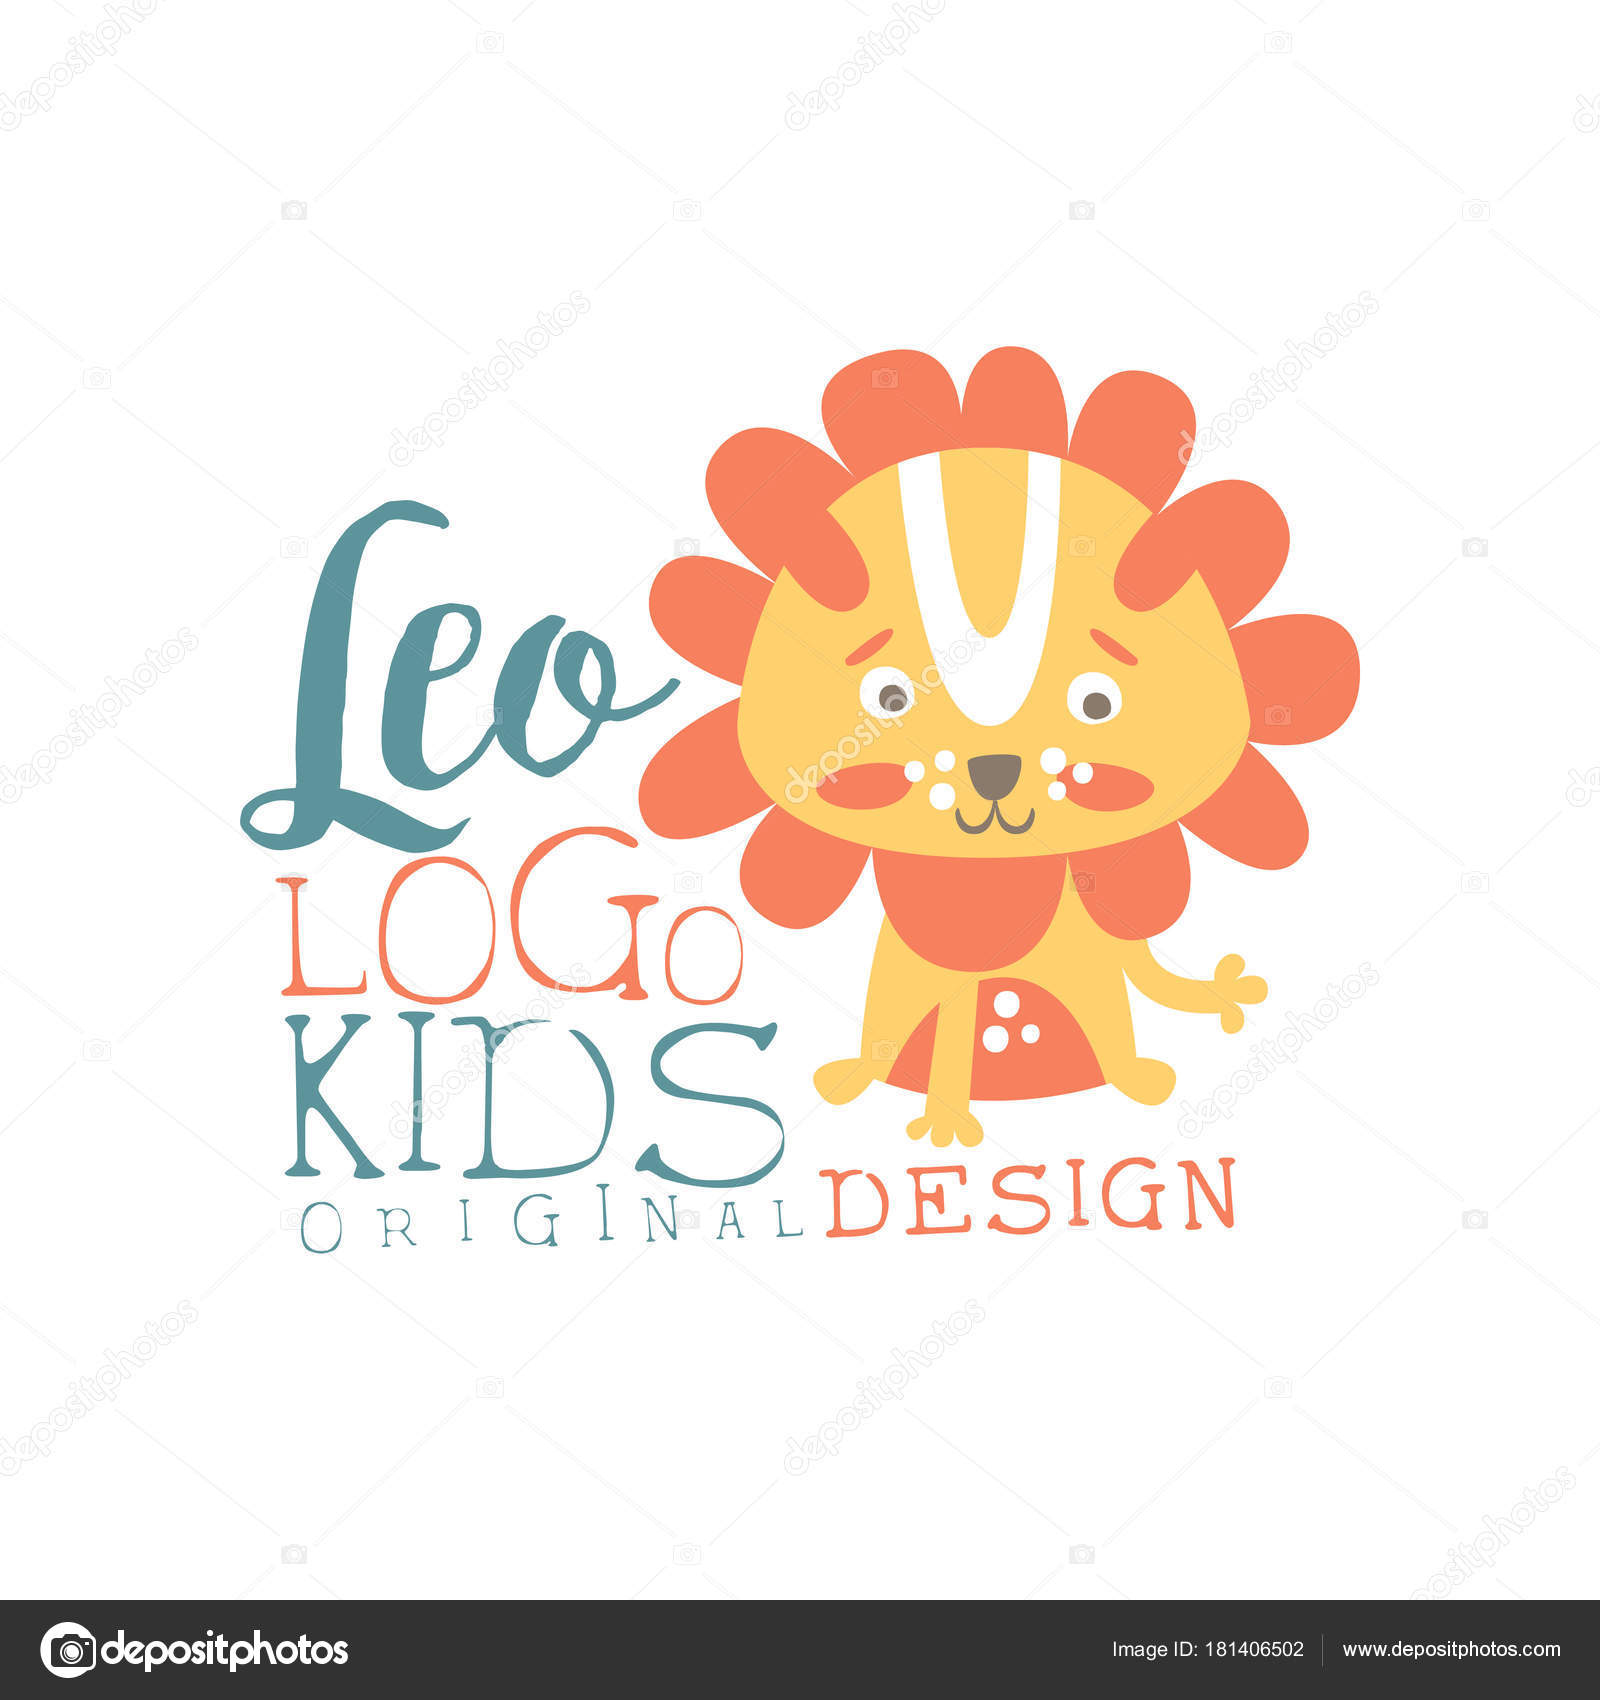 Leo Kids Logo Original Design, Baby Shop Label, Fashion Print For Kids Wear, Baby Shower